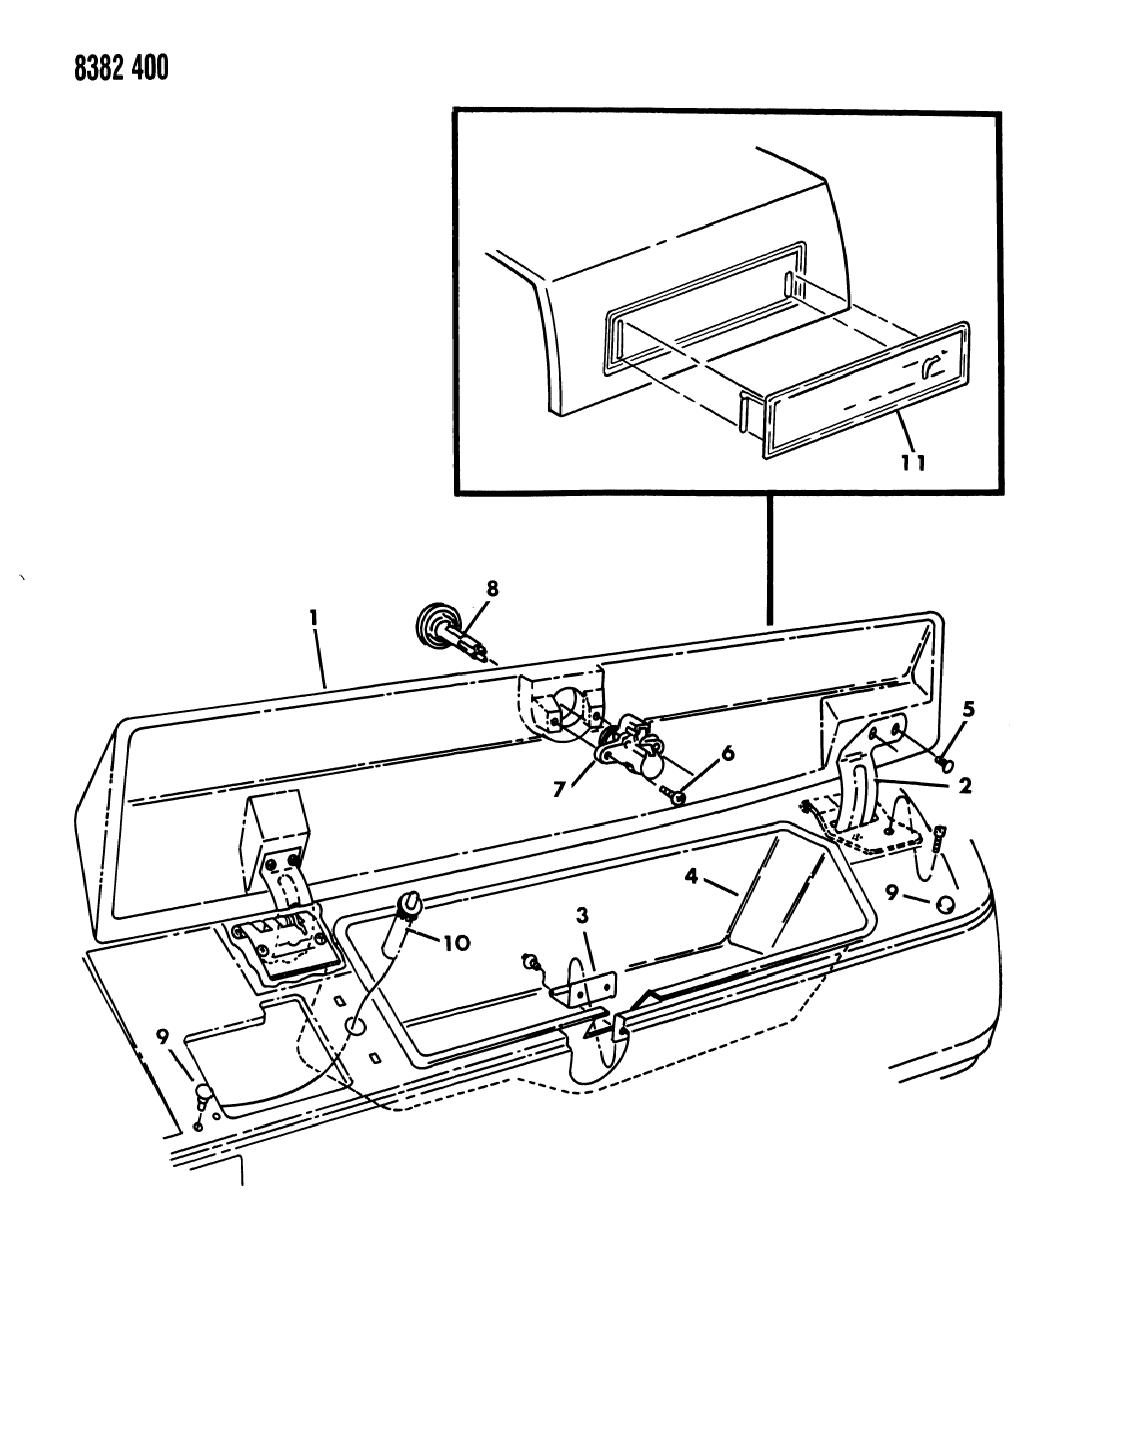 1989 Dodge Ram Van Instrument Panel Gbox - Mopar Parts Giant on